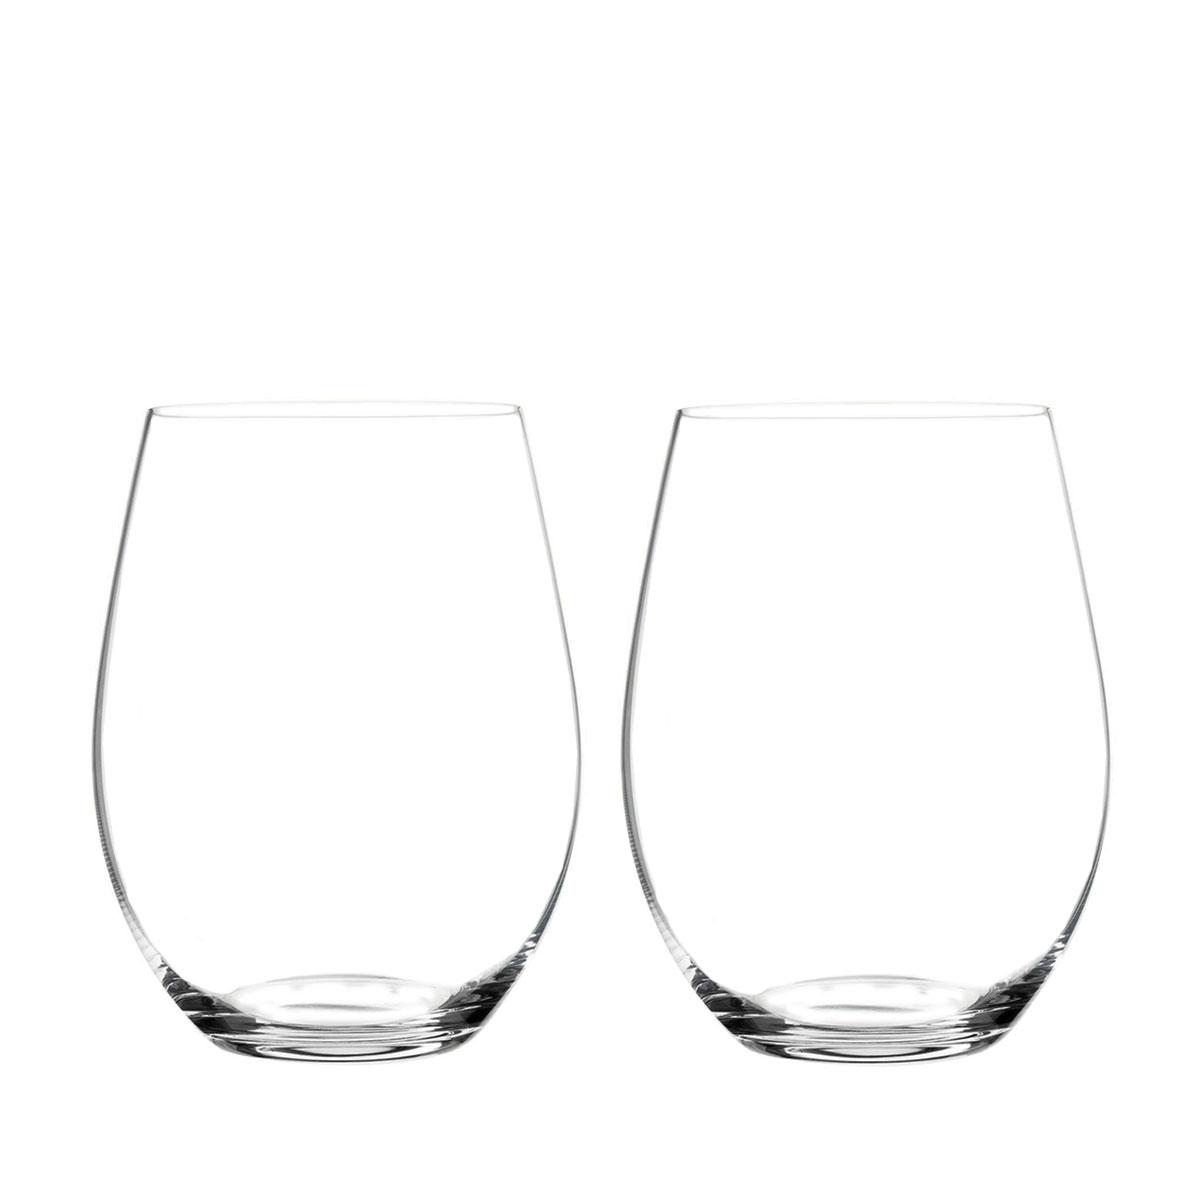 Riedel Big O Stemless, Cabernet Wine Glasses, Pair